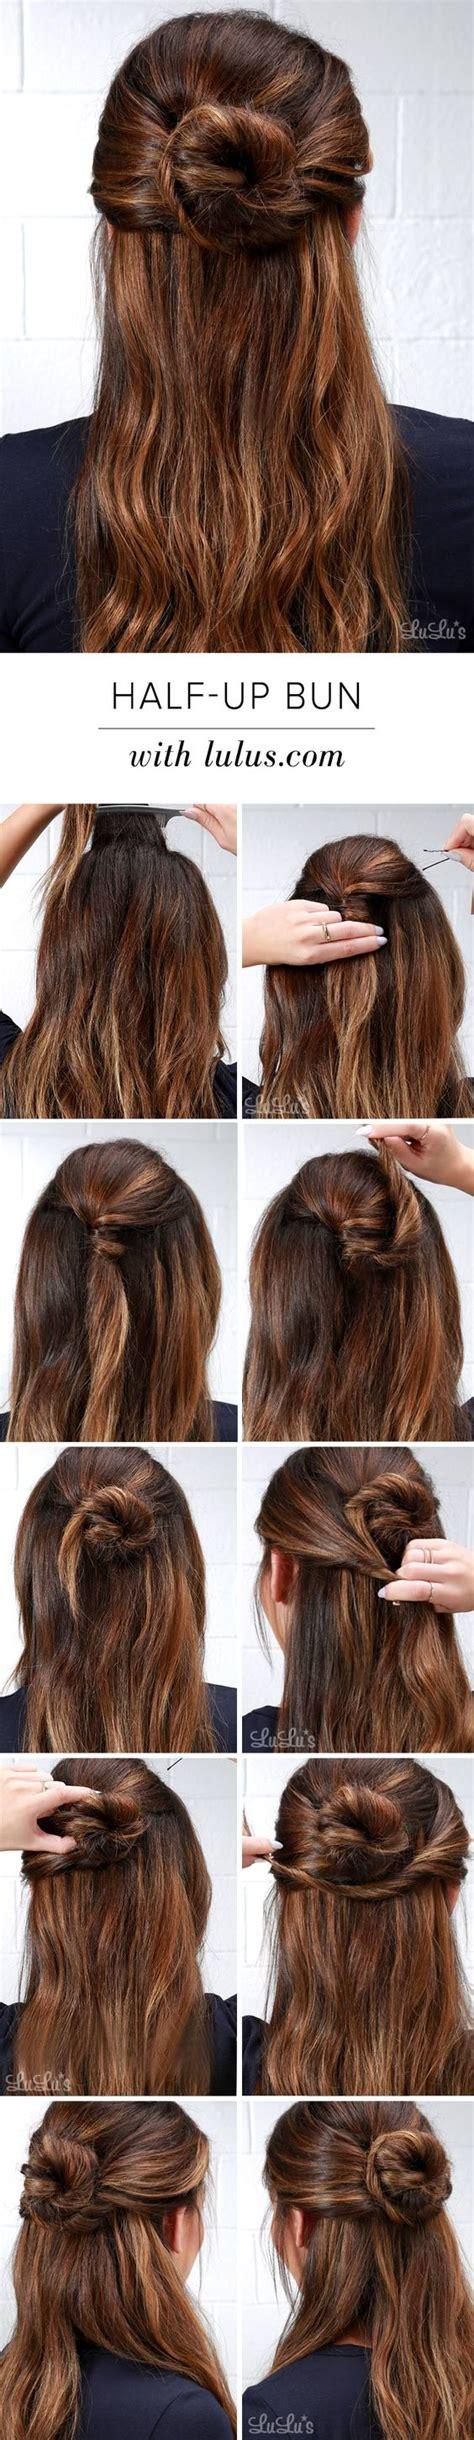 half up bun hairstyles tutorial 26 amazing bun updo ideas for long medium length hair